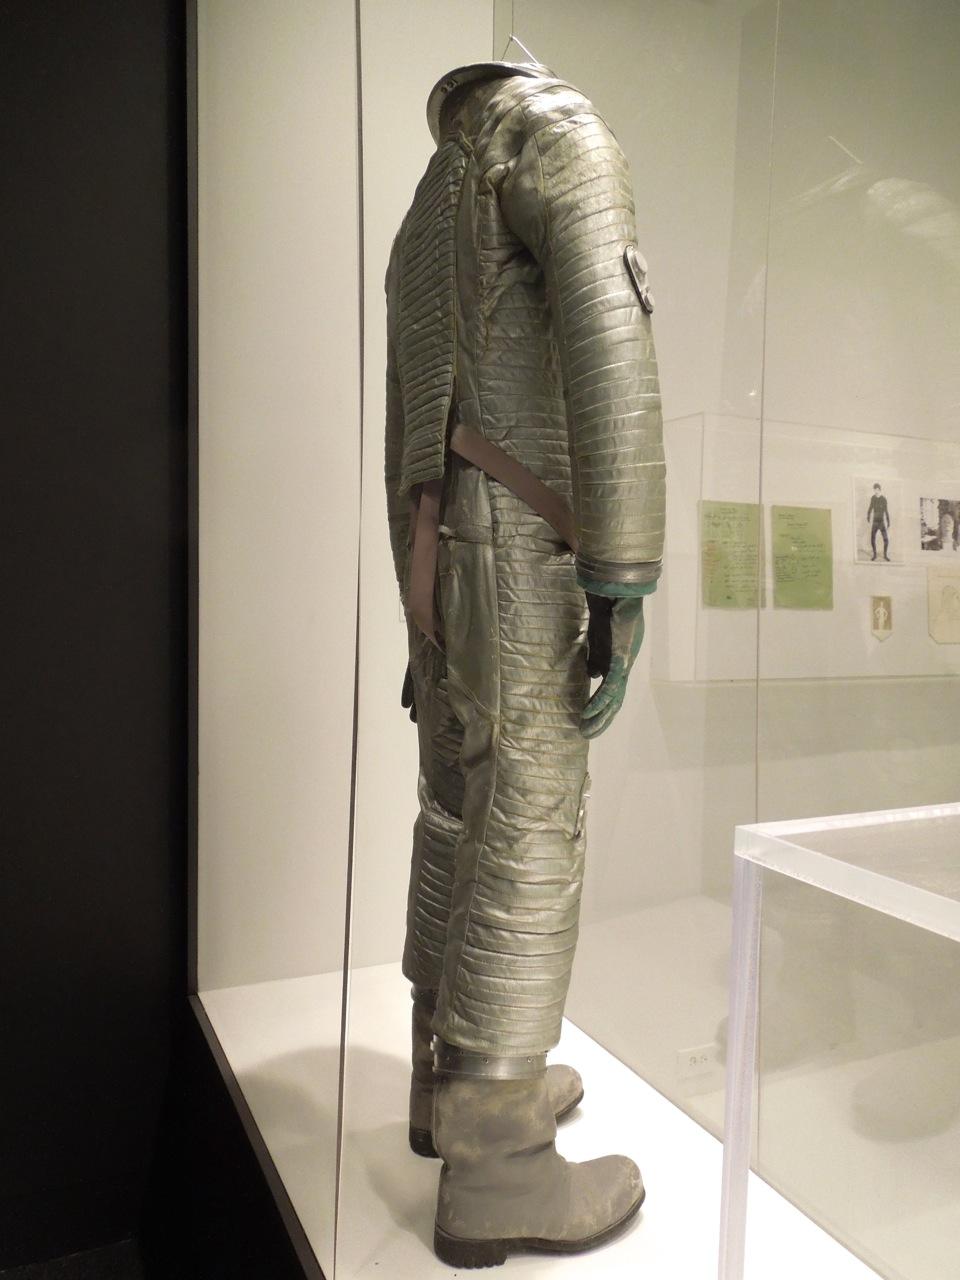 2001 space suit movie - photo #20